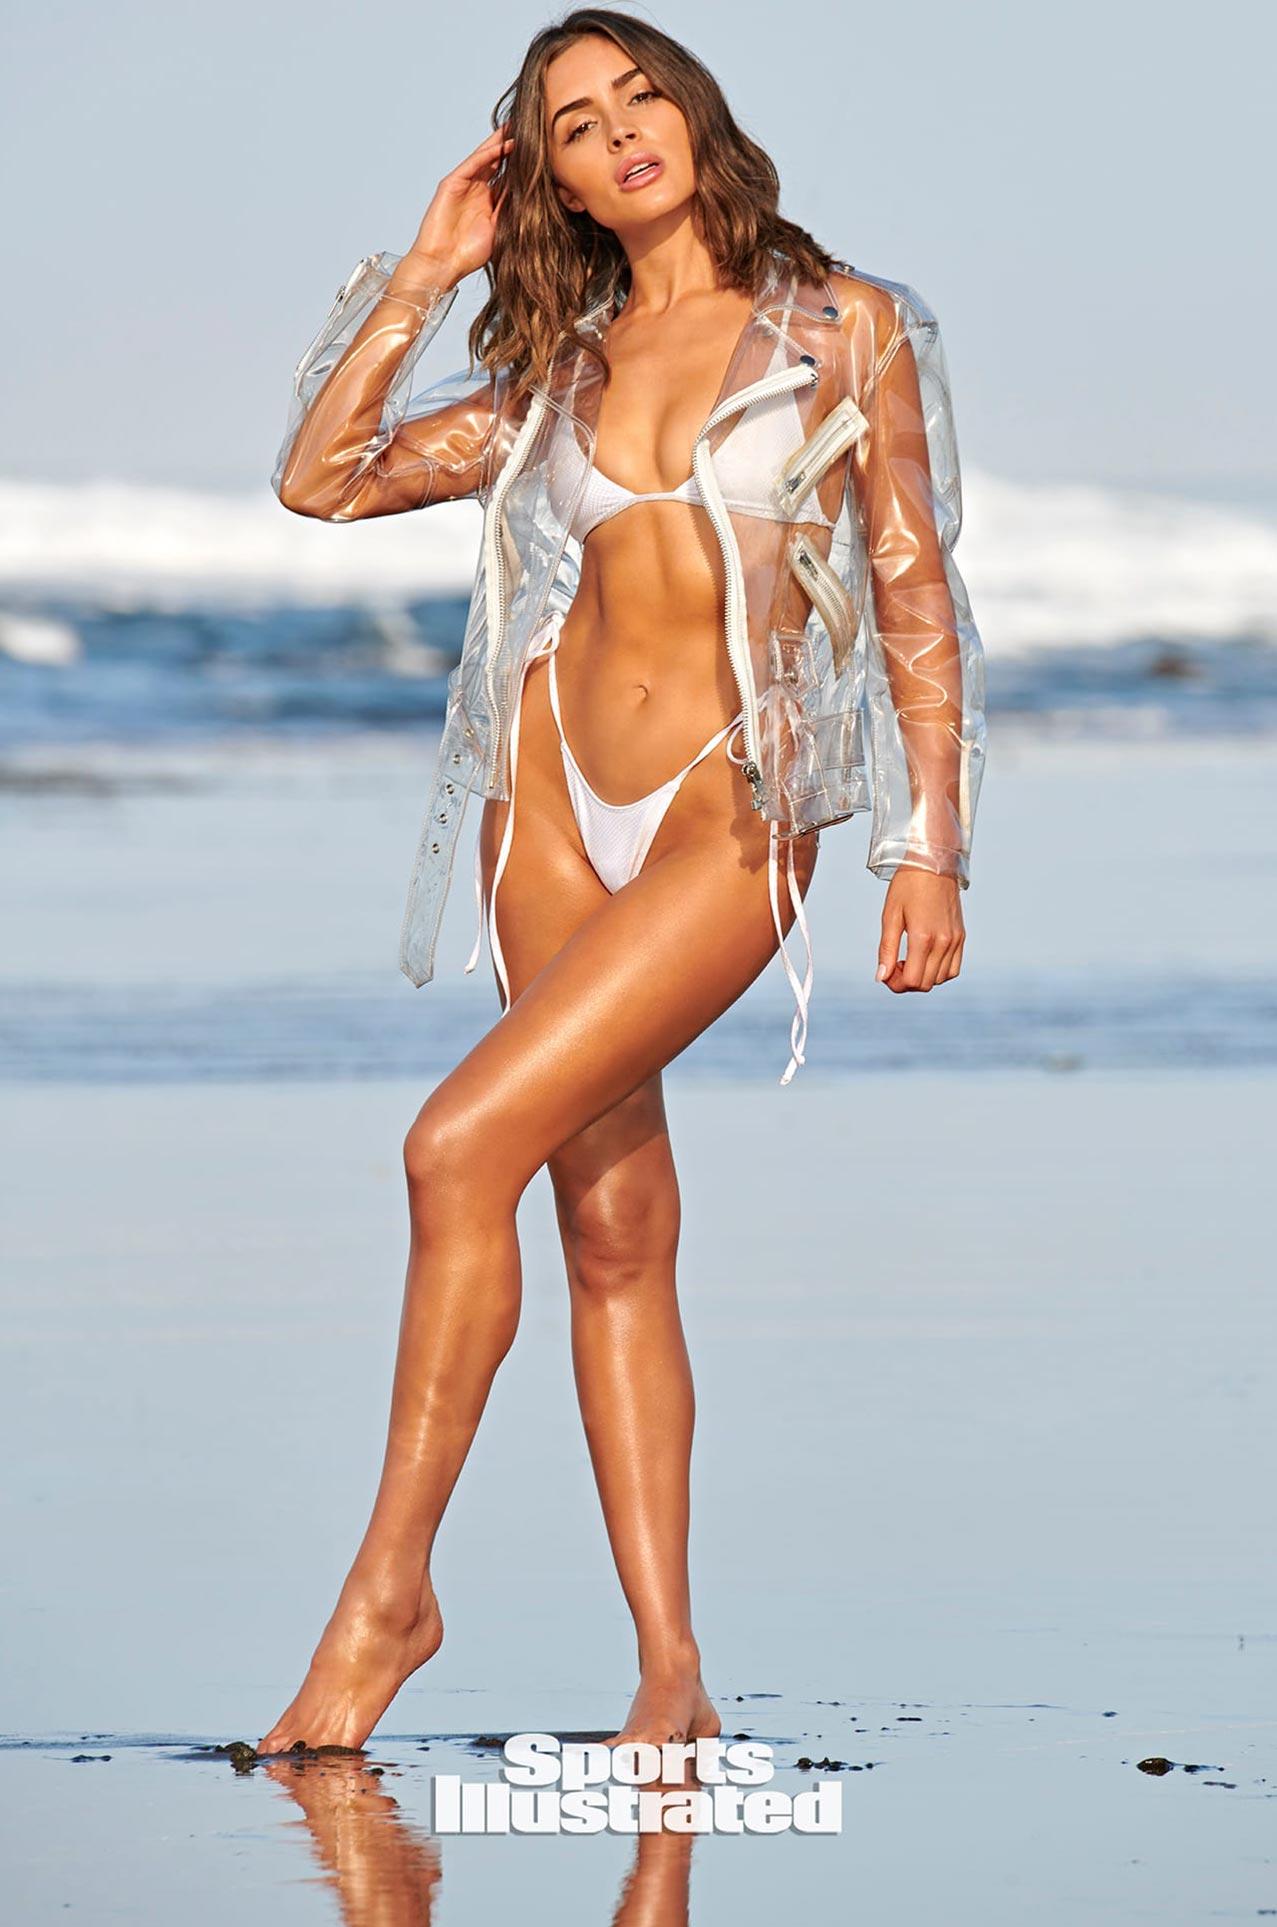 Оливия Калпо в каталоге купальников Sports Illustrated Swimsuit 2020 / фото 08